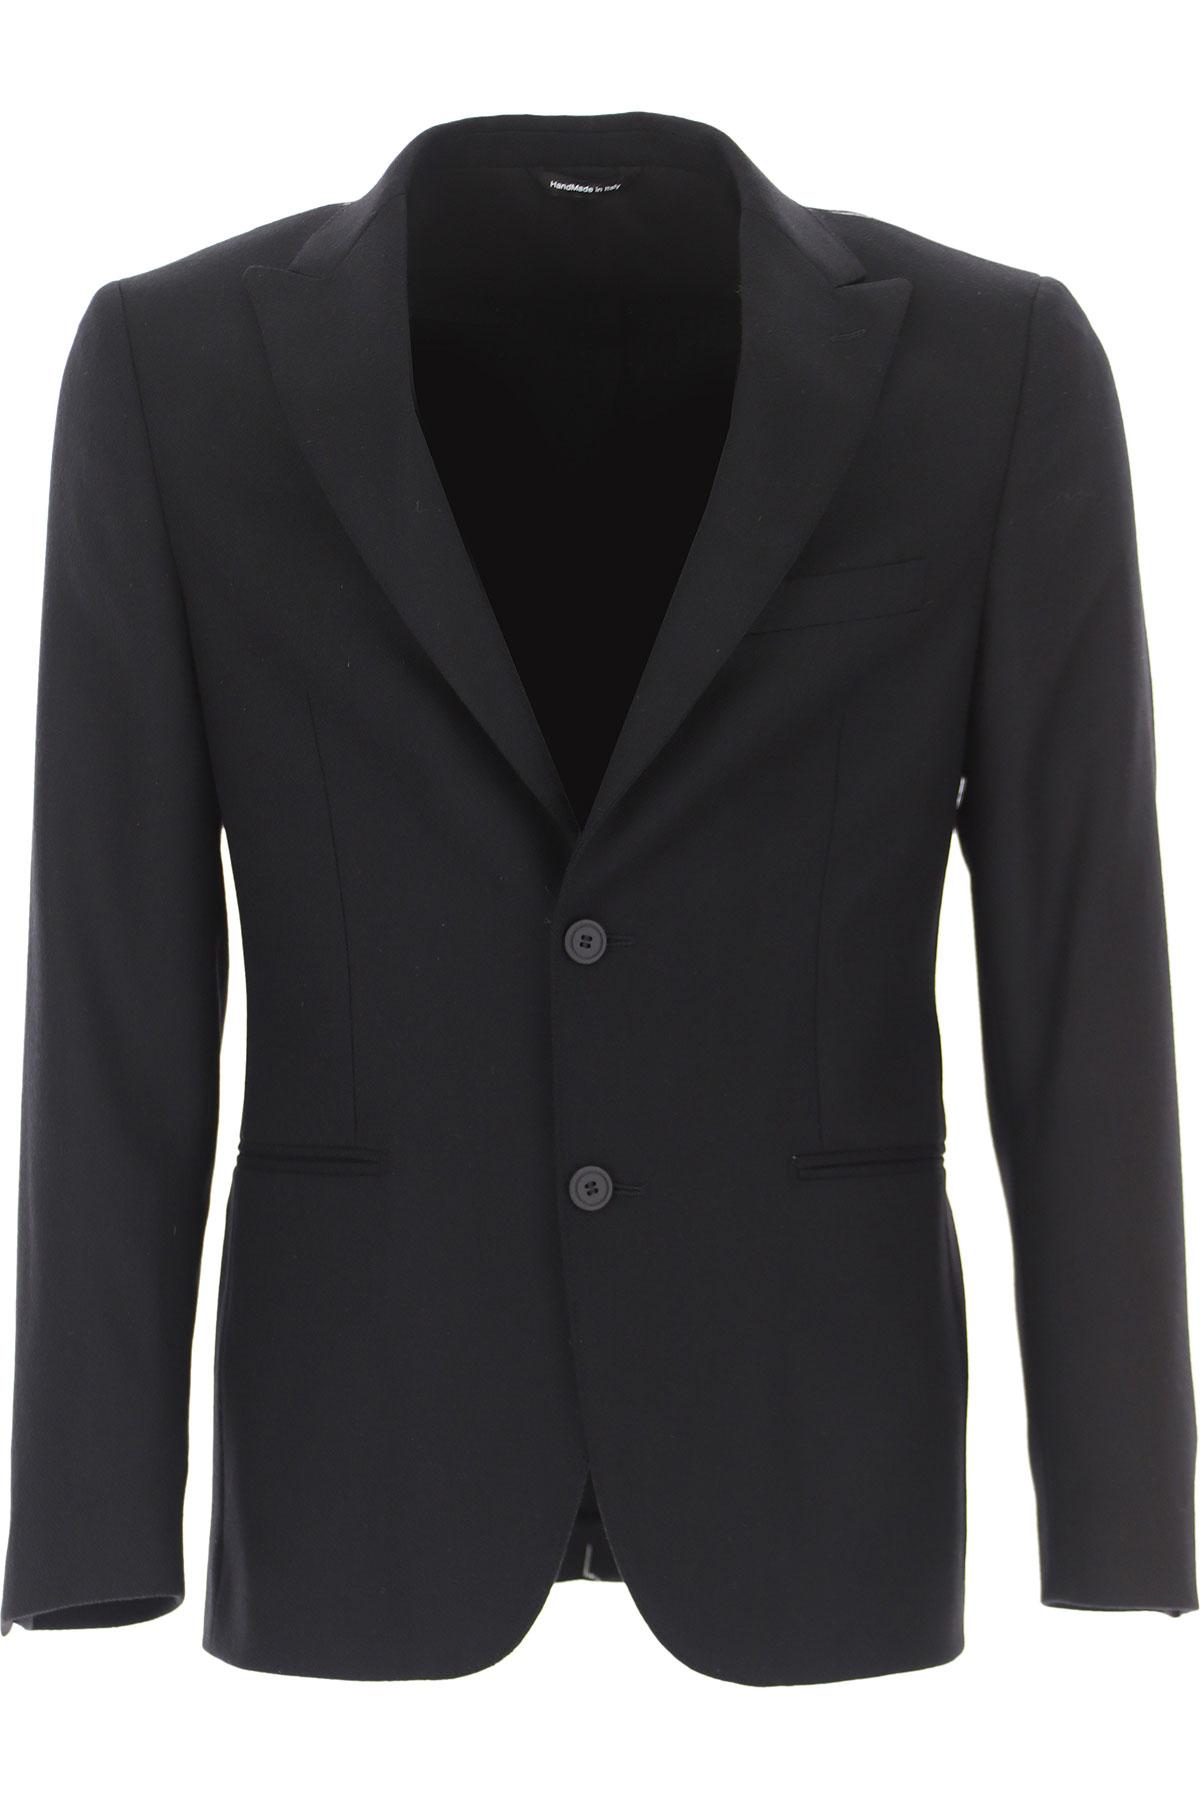 Tonello Blazer for Men, Sport Coat On Sale, Black, Cashemere, 2019, L M S